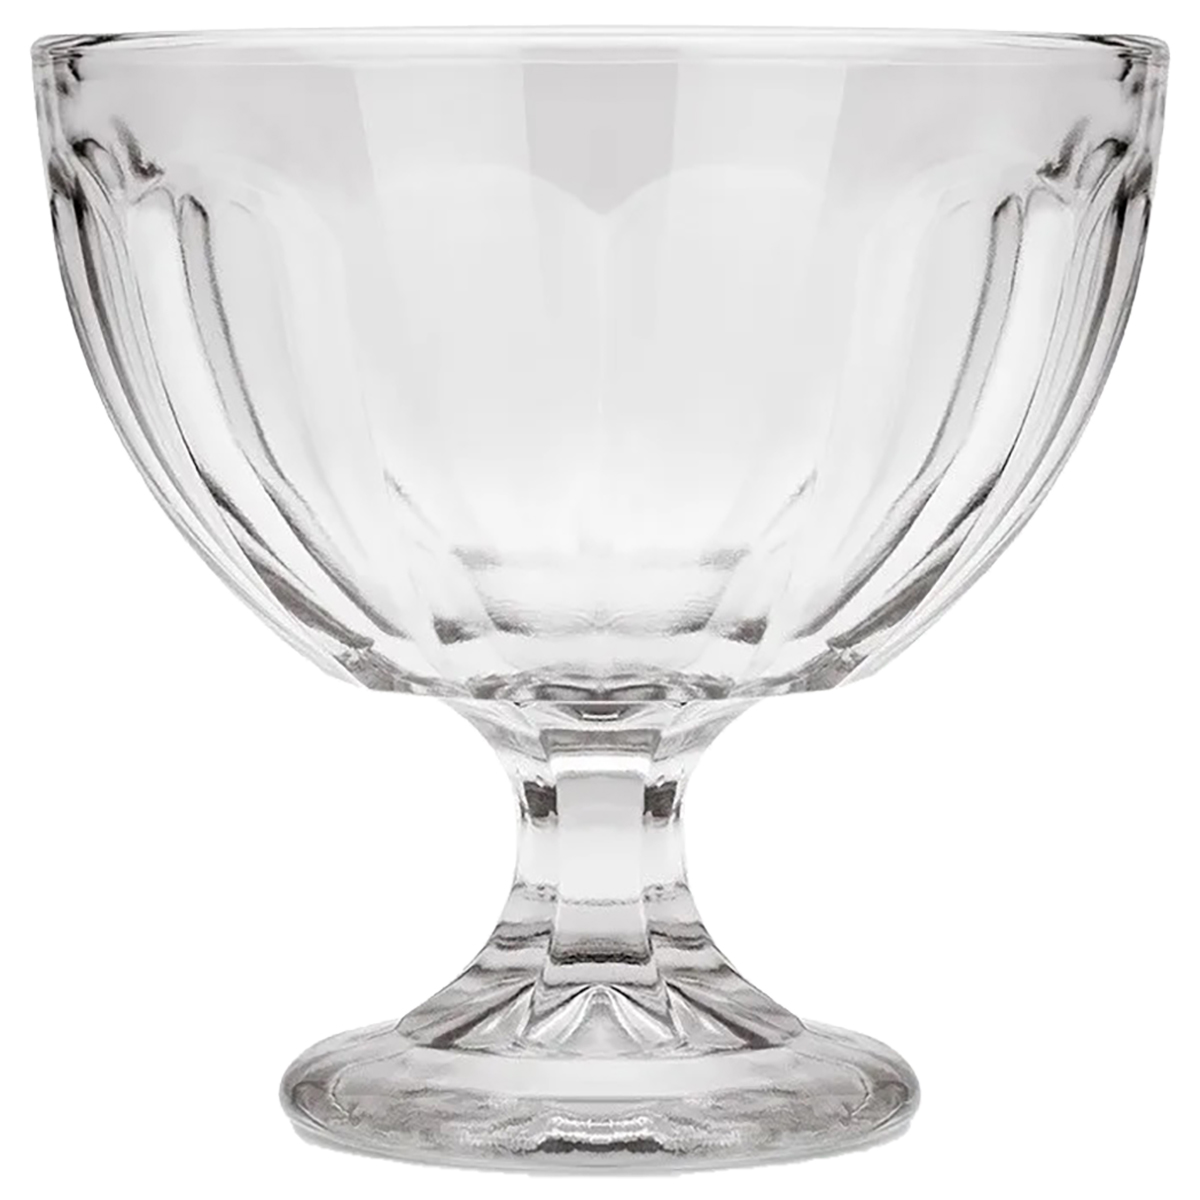 Jogo 6 Taças Sobremesa Vidro Pavillion 485ml 12x12cm Brinox